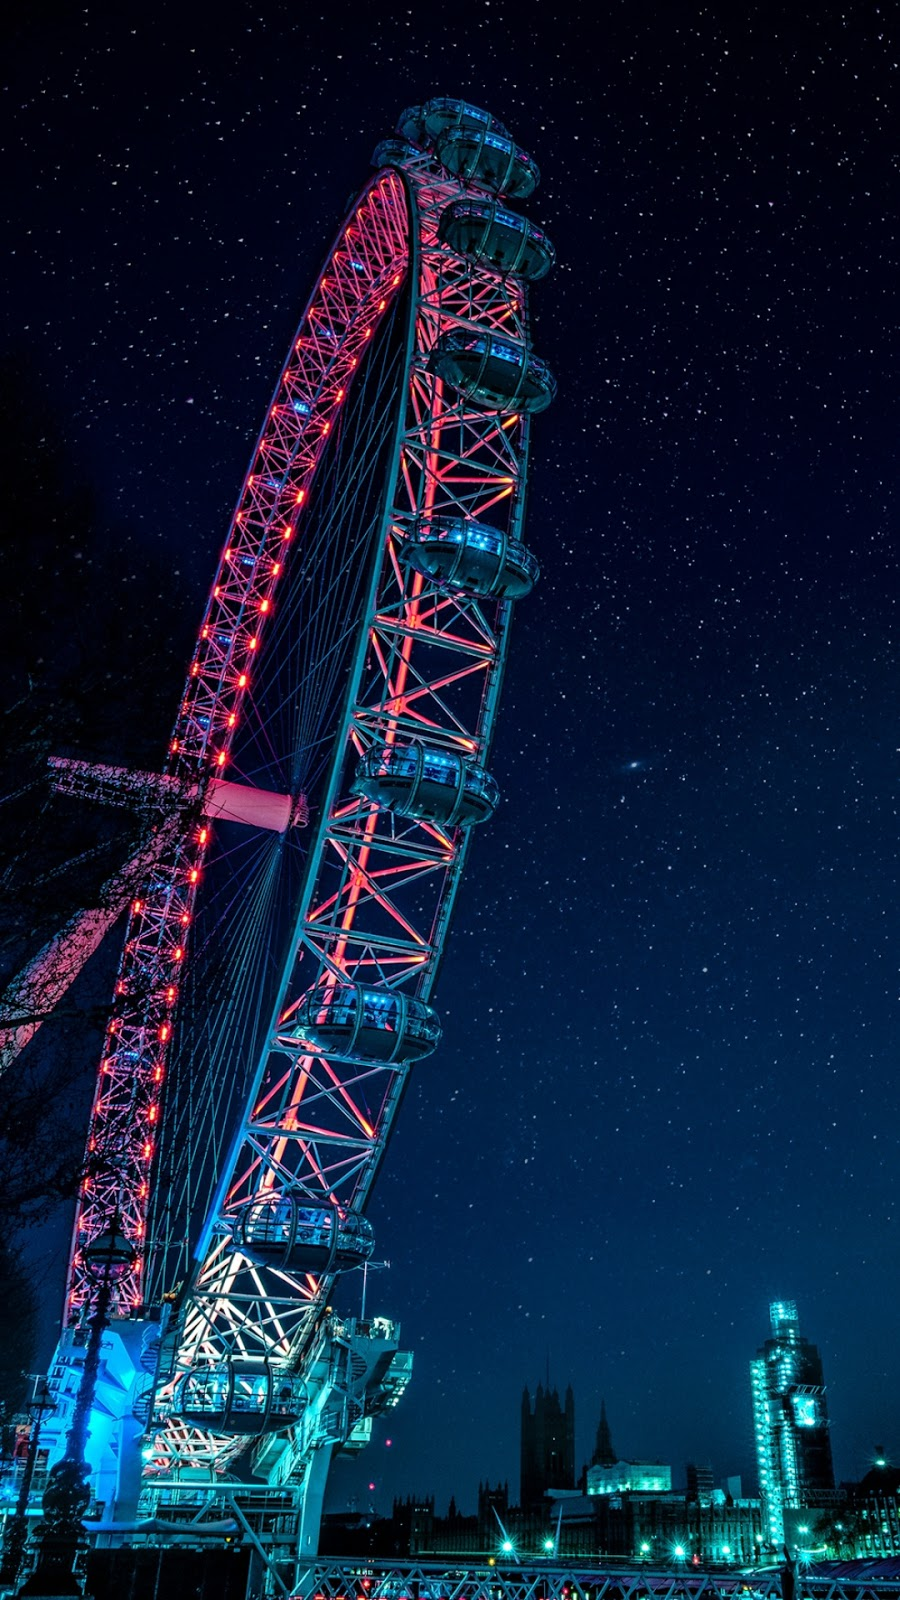 Aesthetic night sky